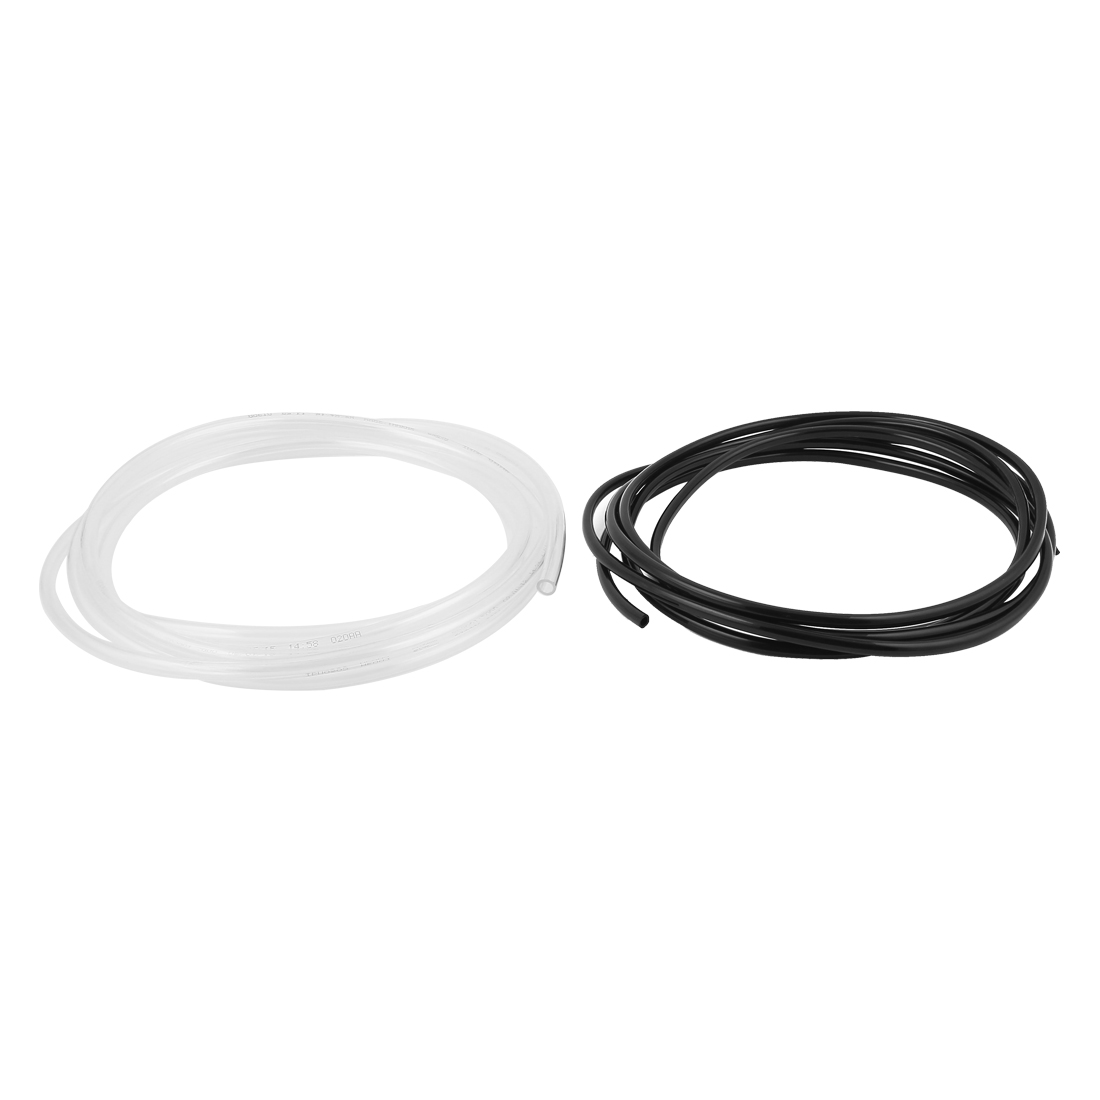 2pcs 3Meter 10Ft Long White Black Flexible Tubing Polyurethane PU Air Pneumatic Line Hose Pipe Tube